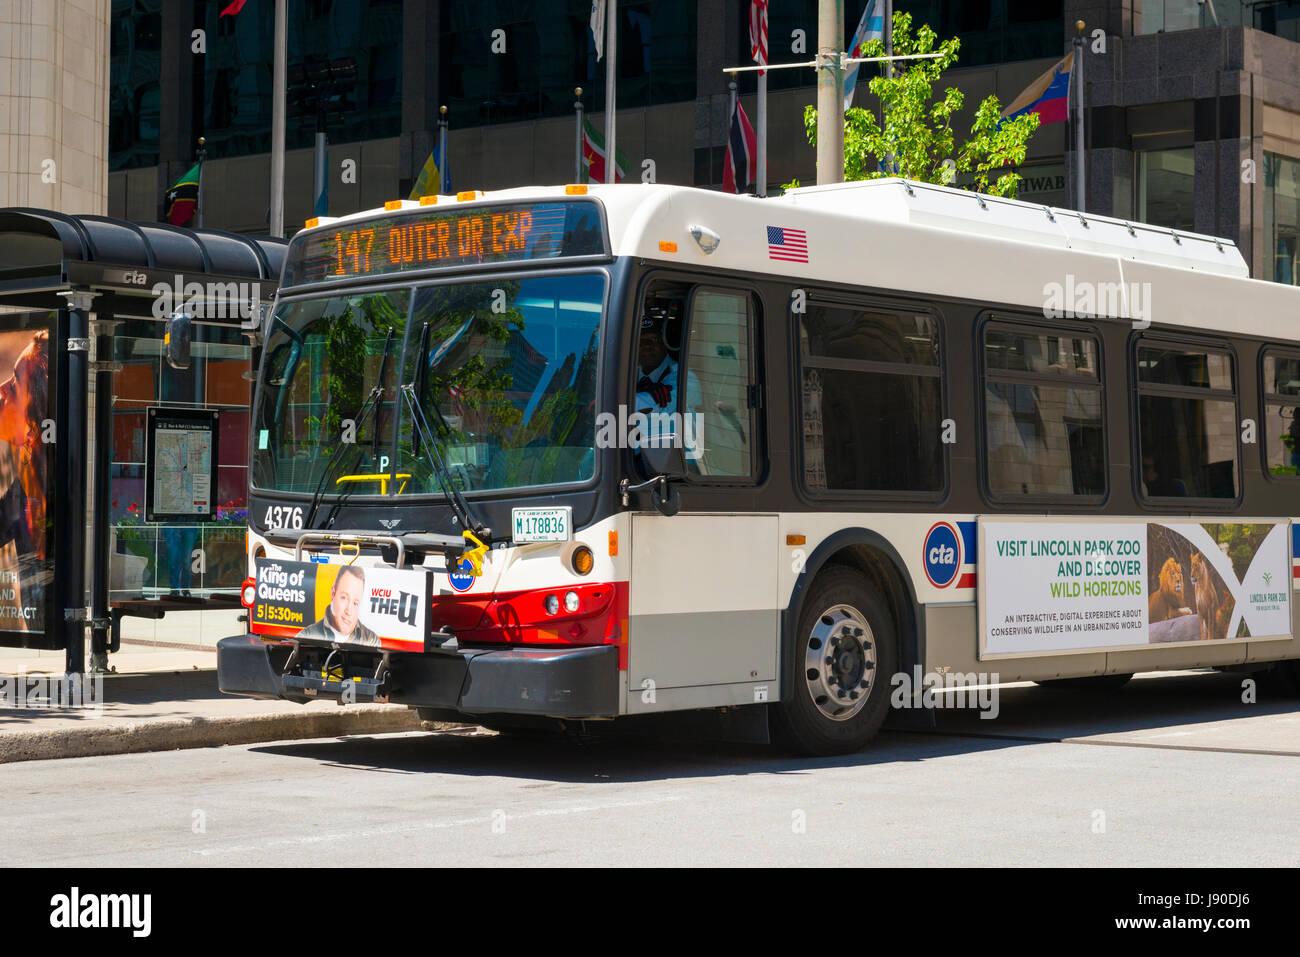 Chicago Illinois Near North Side Michigan Avenue CTA 147 bus public transport bus stop bike rack on front street - Stock Image